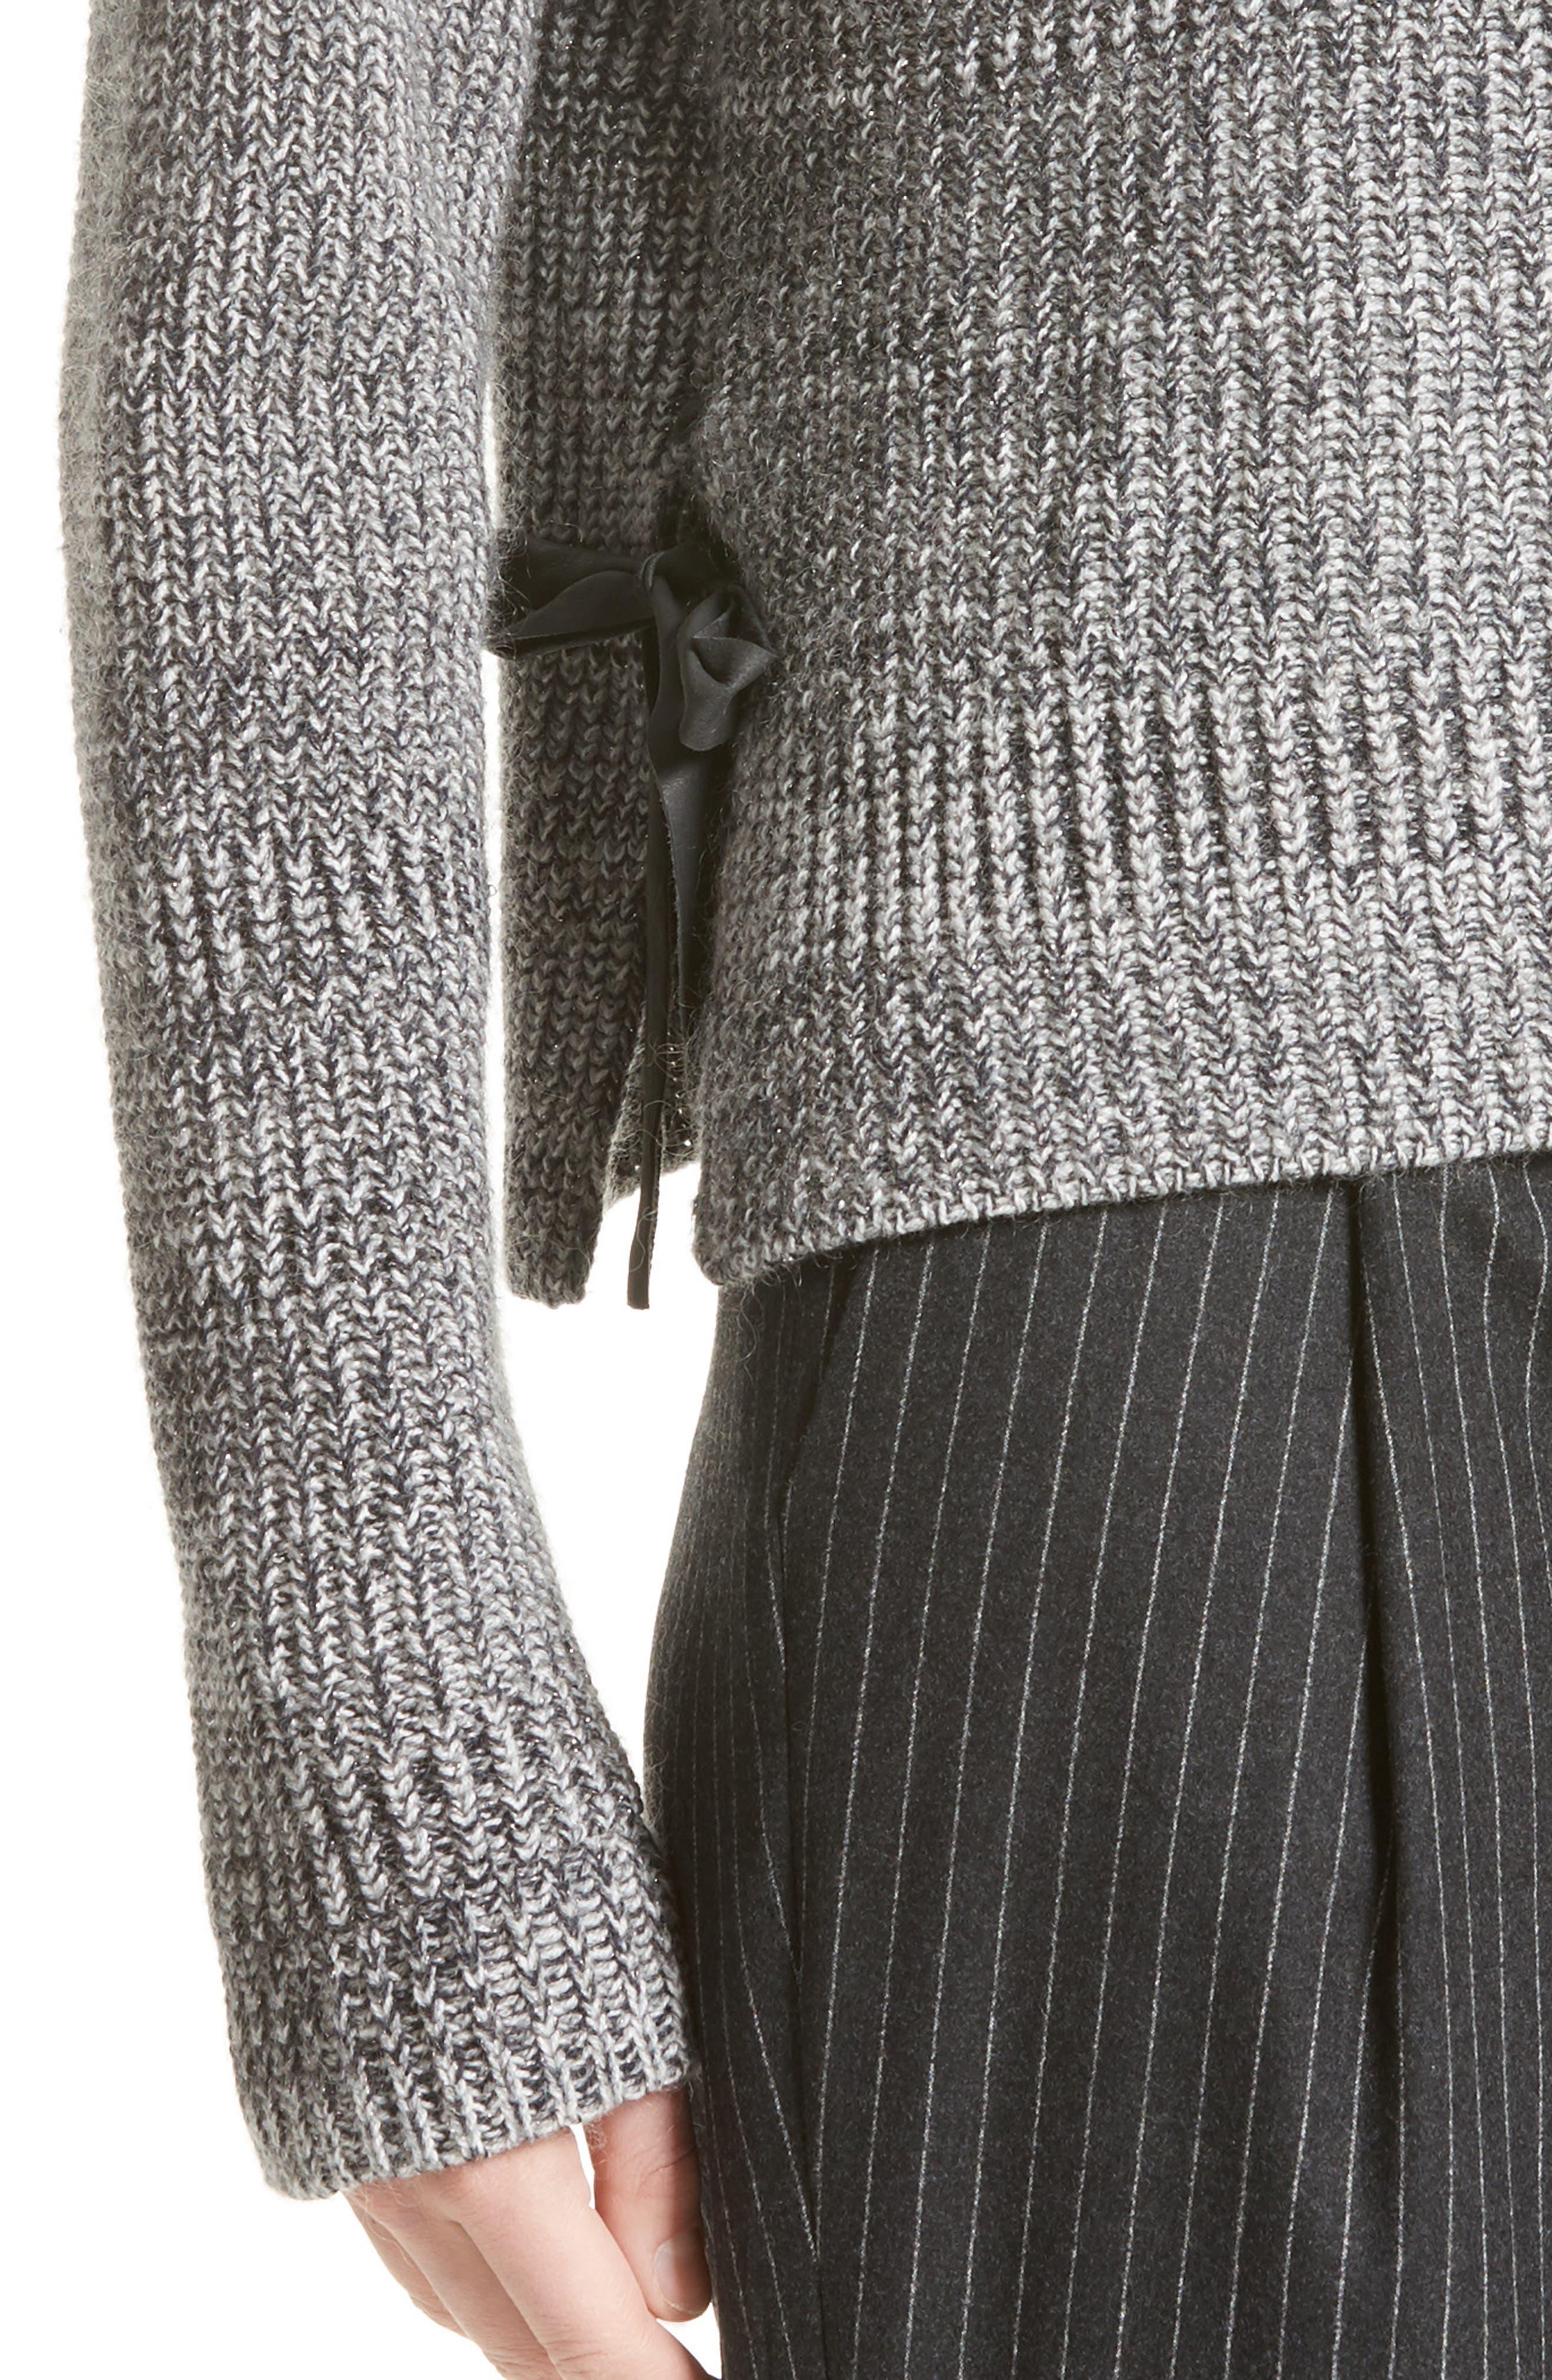 Herringbone Stitch Wool Blend Sweater,                             Alternate thumbnail 6, color,                             Grey Multi